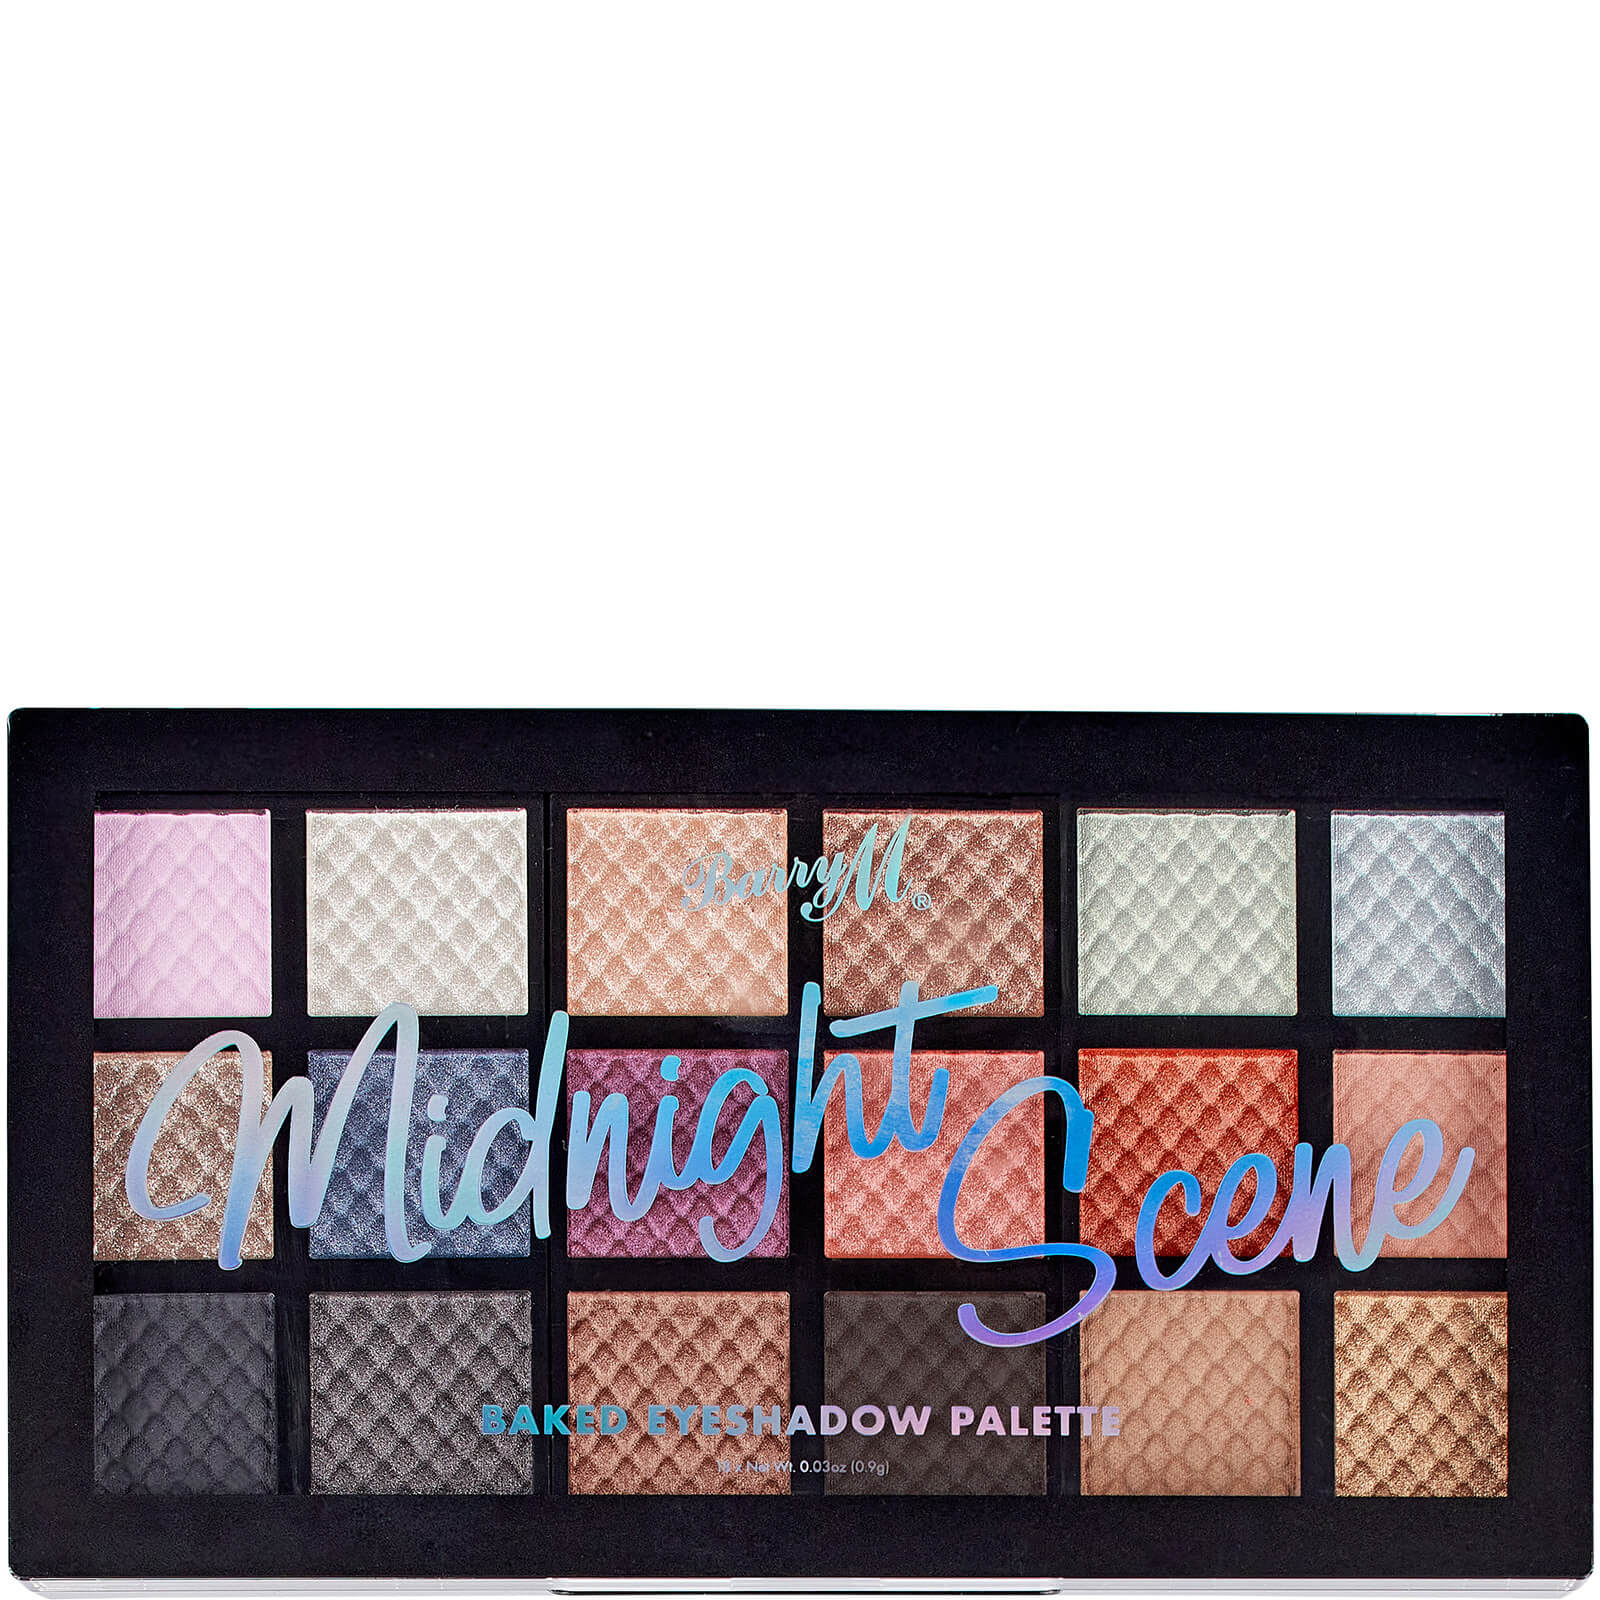 Купить Barry M Cosmetics Baked Eyeshadow Palette - Midnight Scene